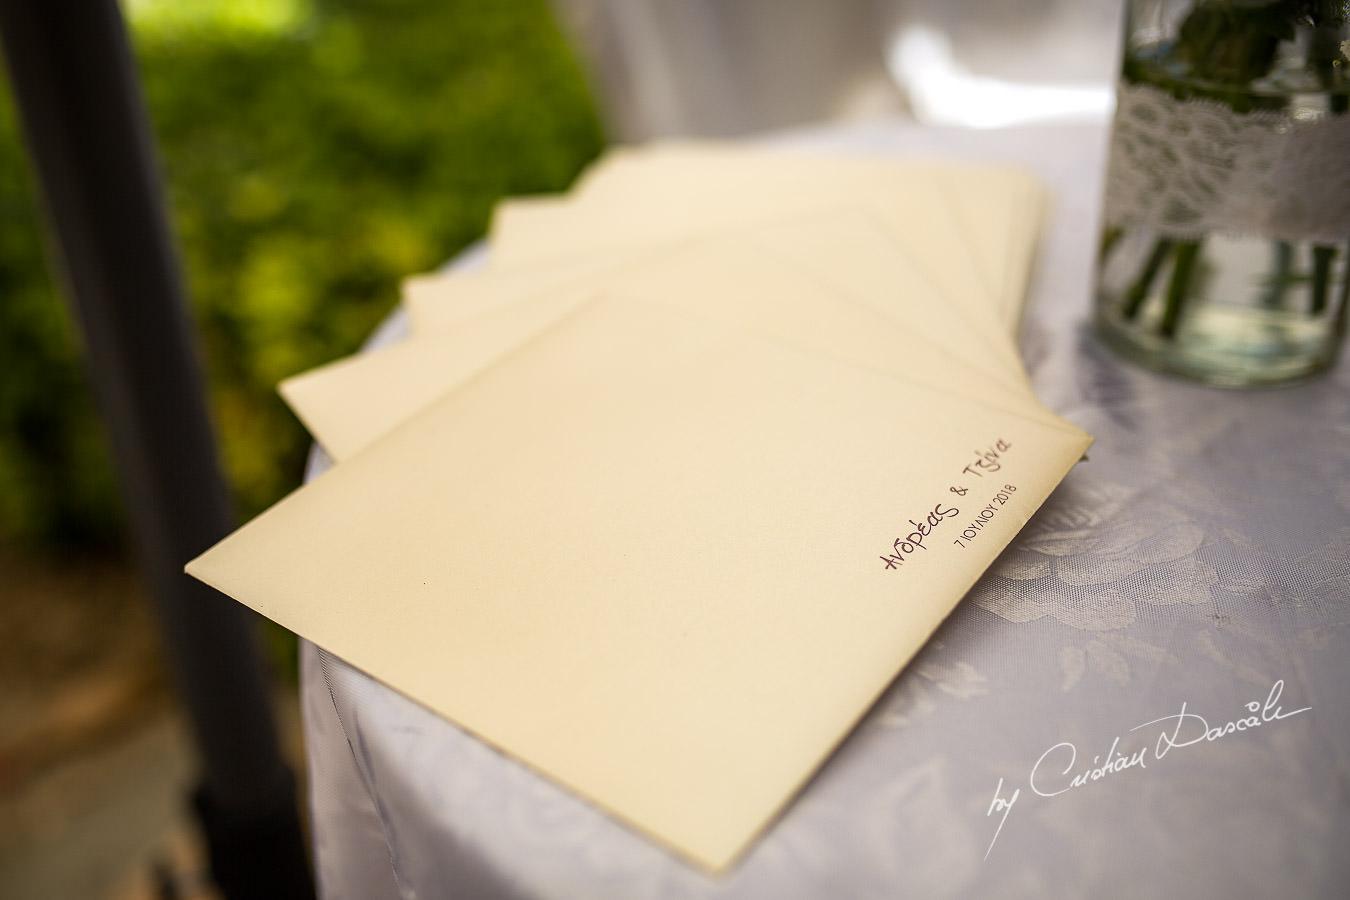 Wedding invitations captured by Cyprus Wedding Photographer Cristian Dascalu at a beautiful wedding in Larnaka, Cyprus.